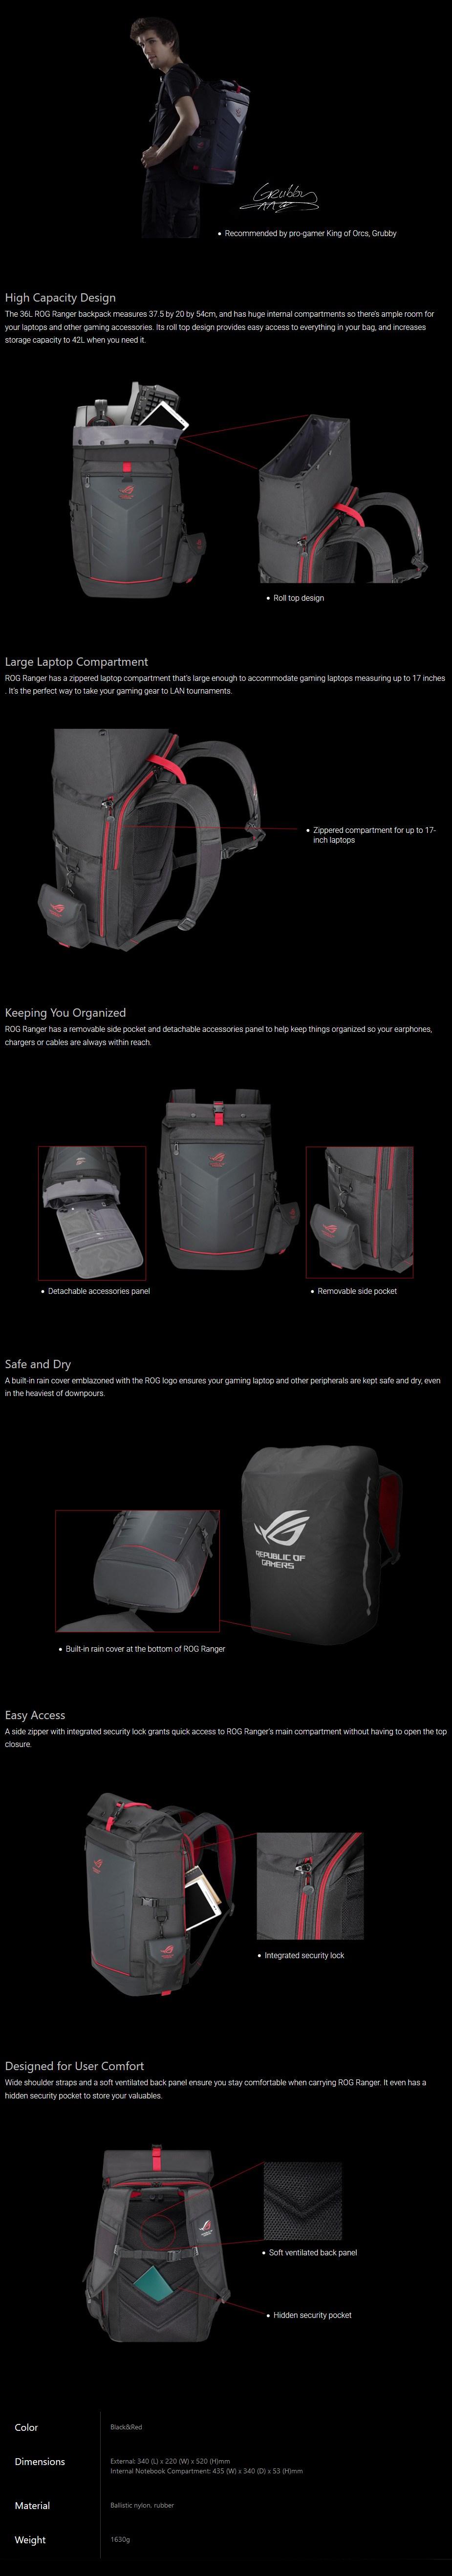 asus-rog-ranger-backpack-for-17-devices-ac31841-4.jpg